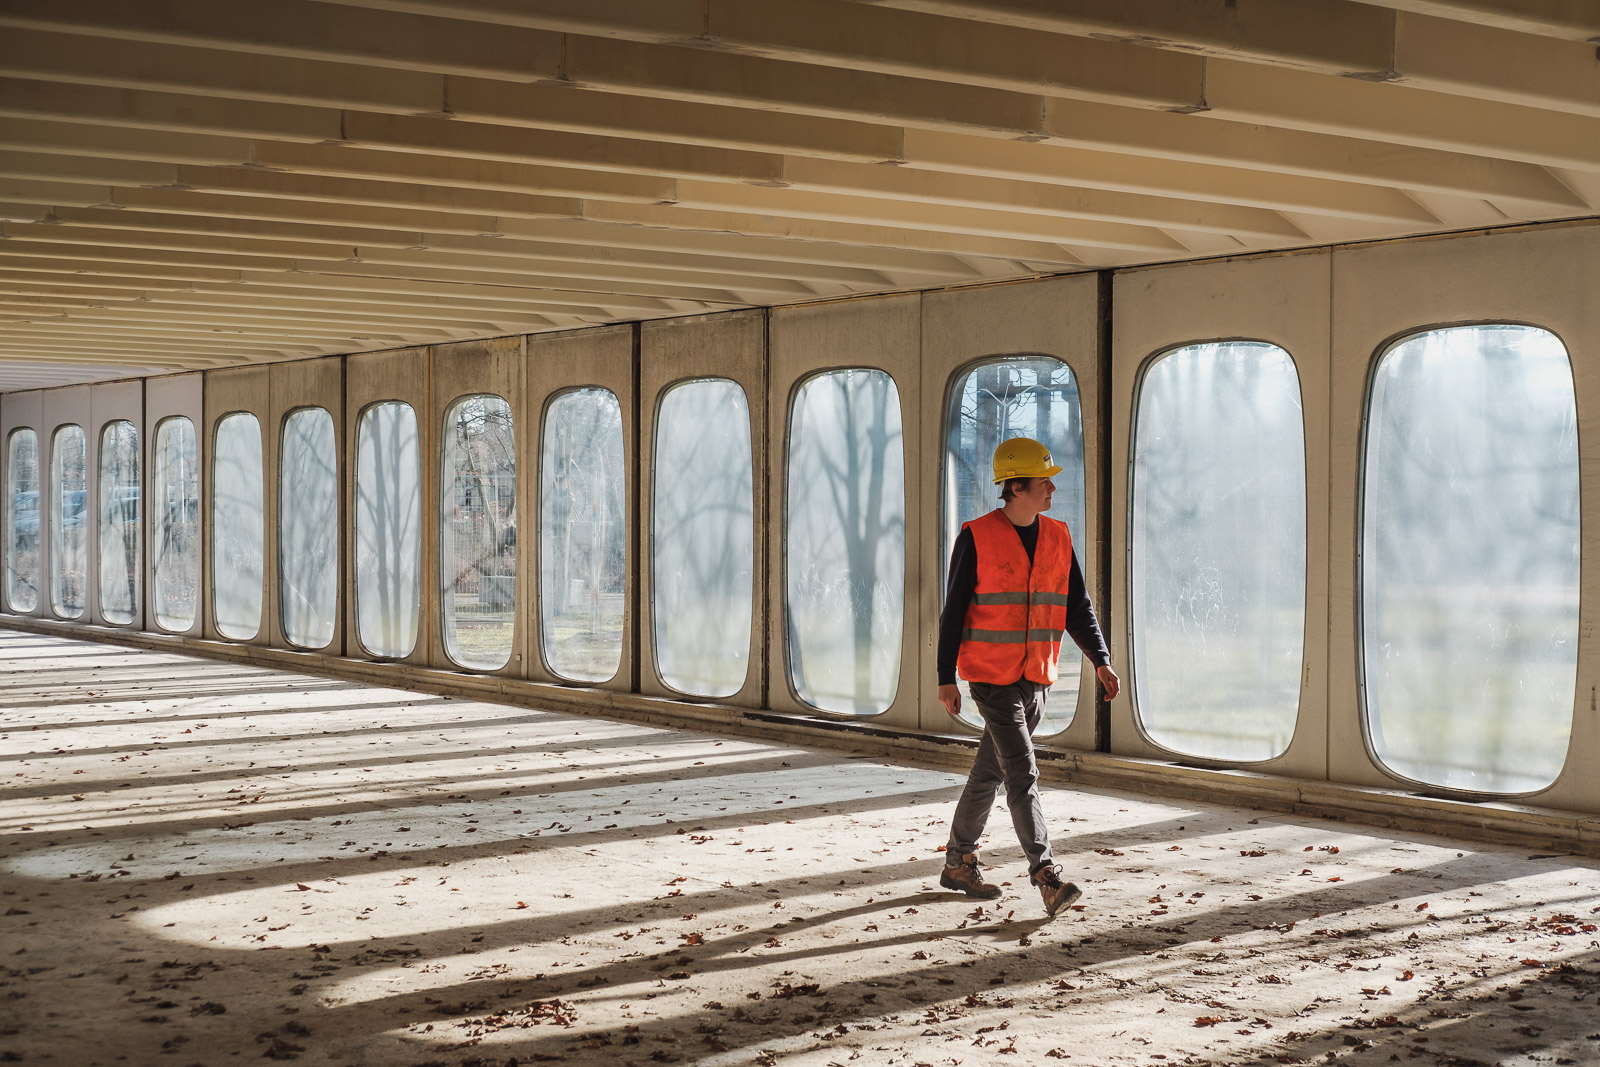 Lukas Aernout beton locatieportret sfeerbeeld licht profielfoto